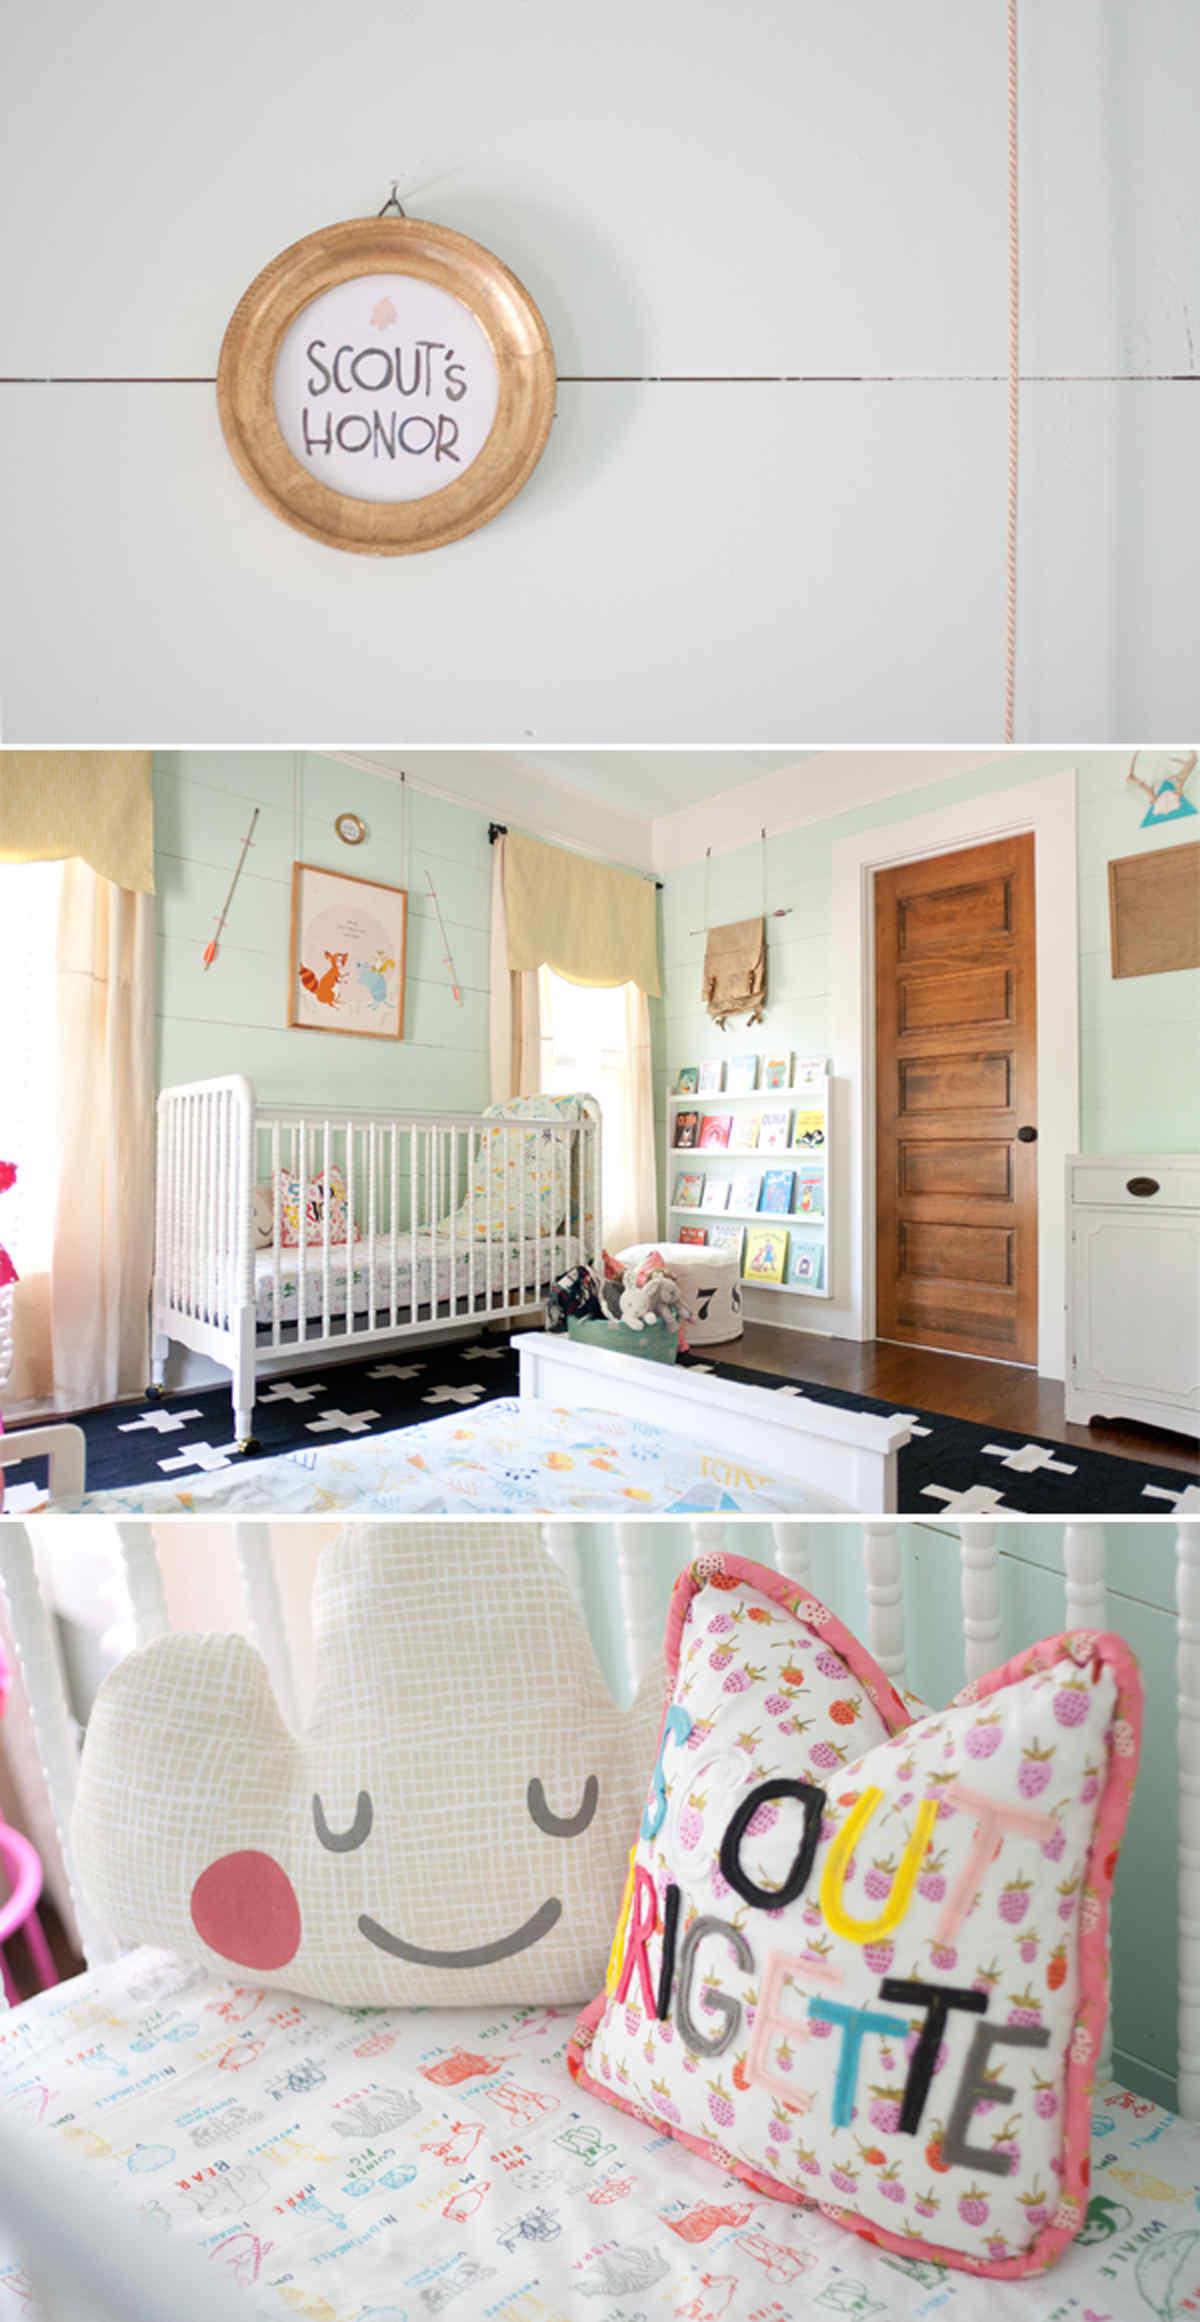 Shared Room Inspiration Lay Baby Lay Lay Baby Lay